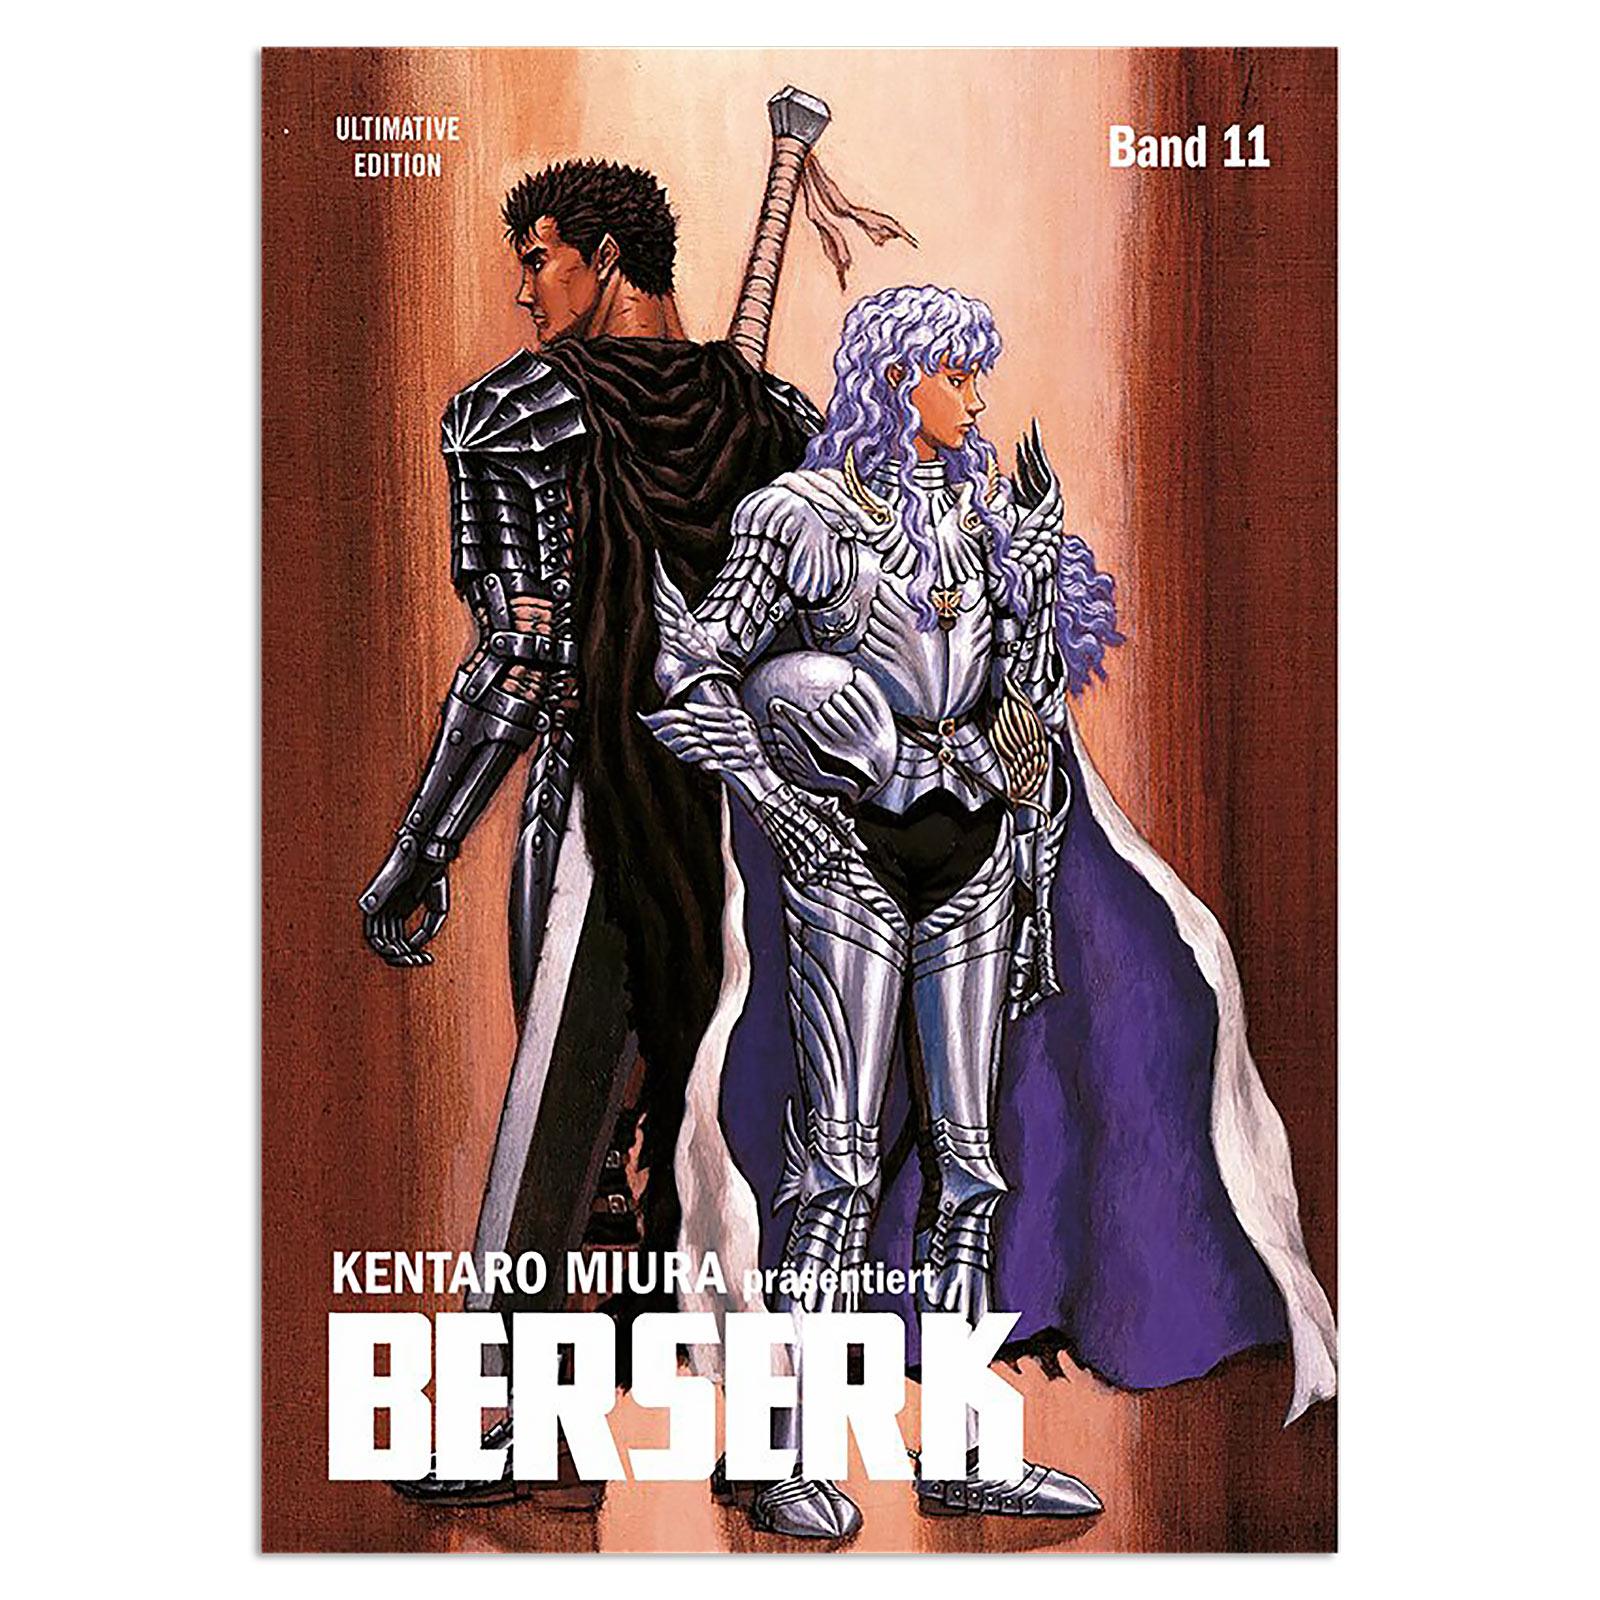 Berserk - Manga Band 11 Ultimate Edition